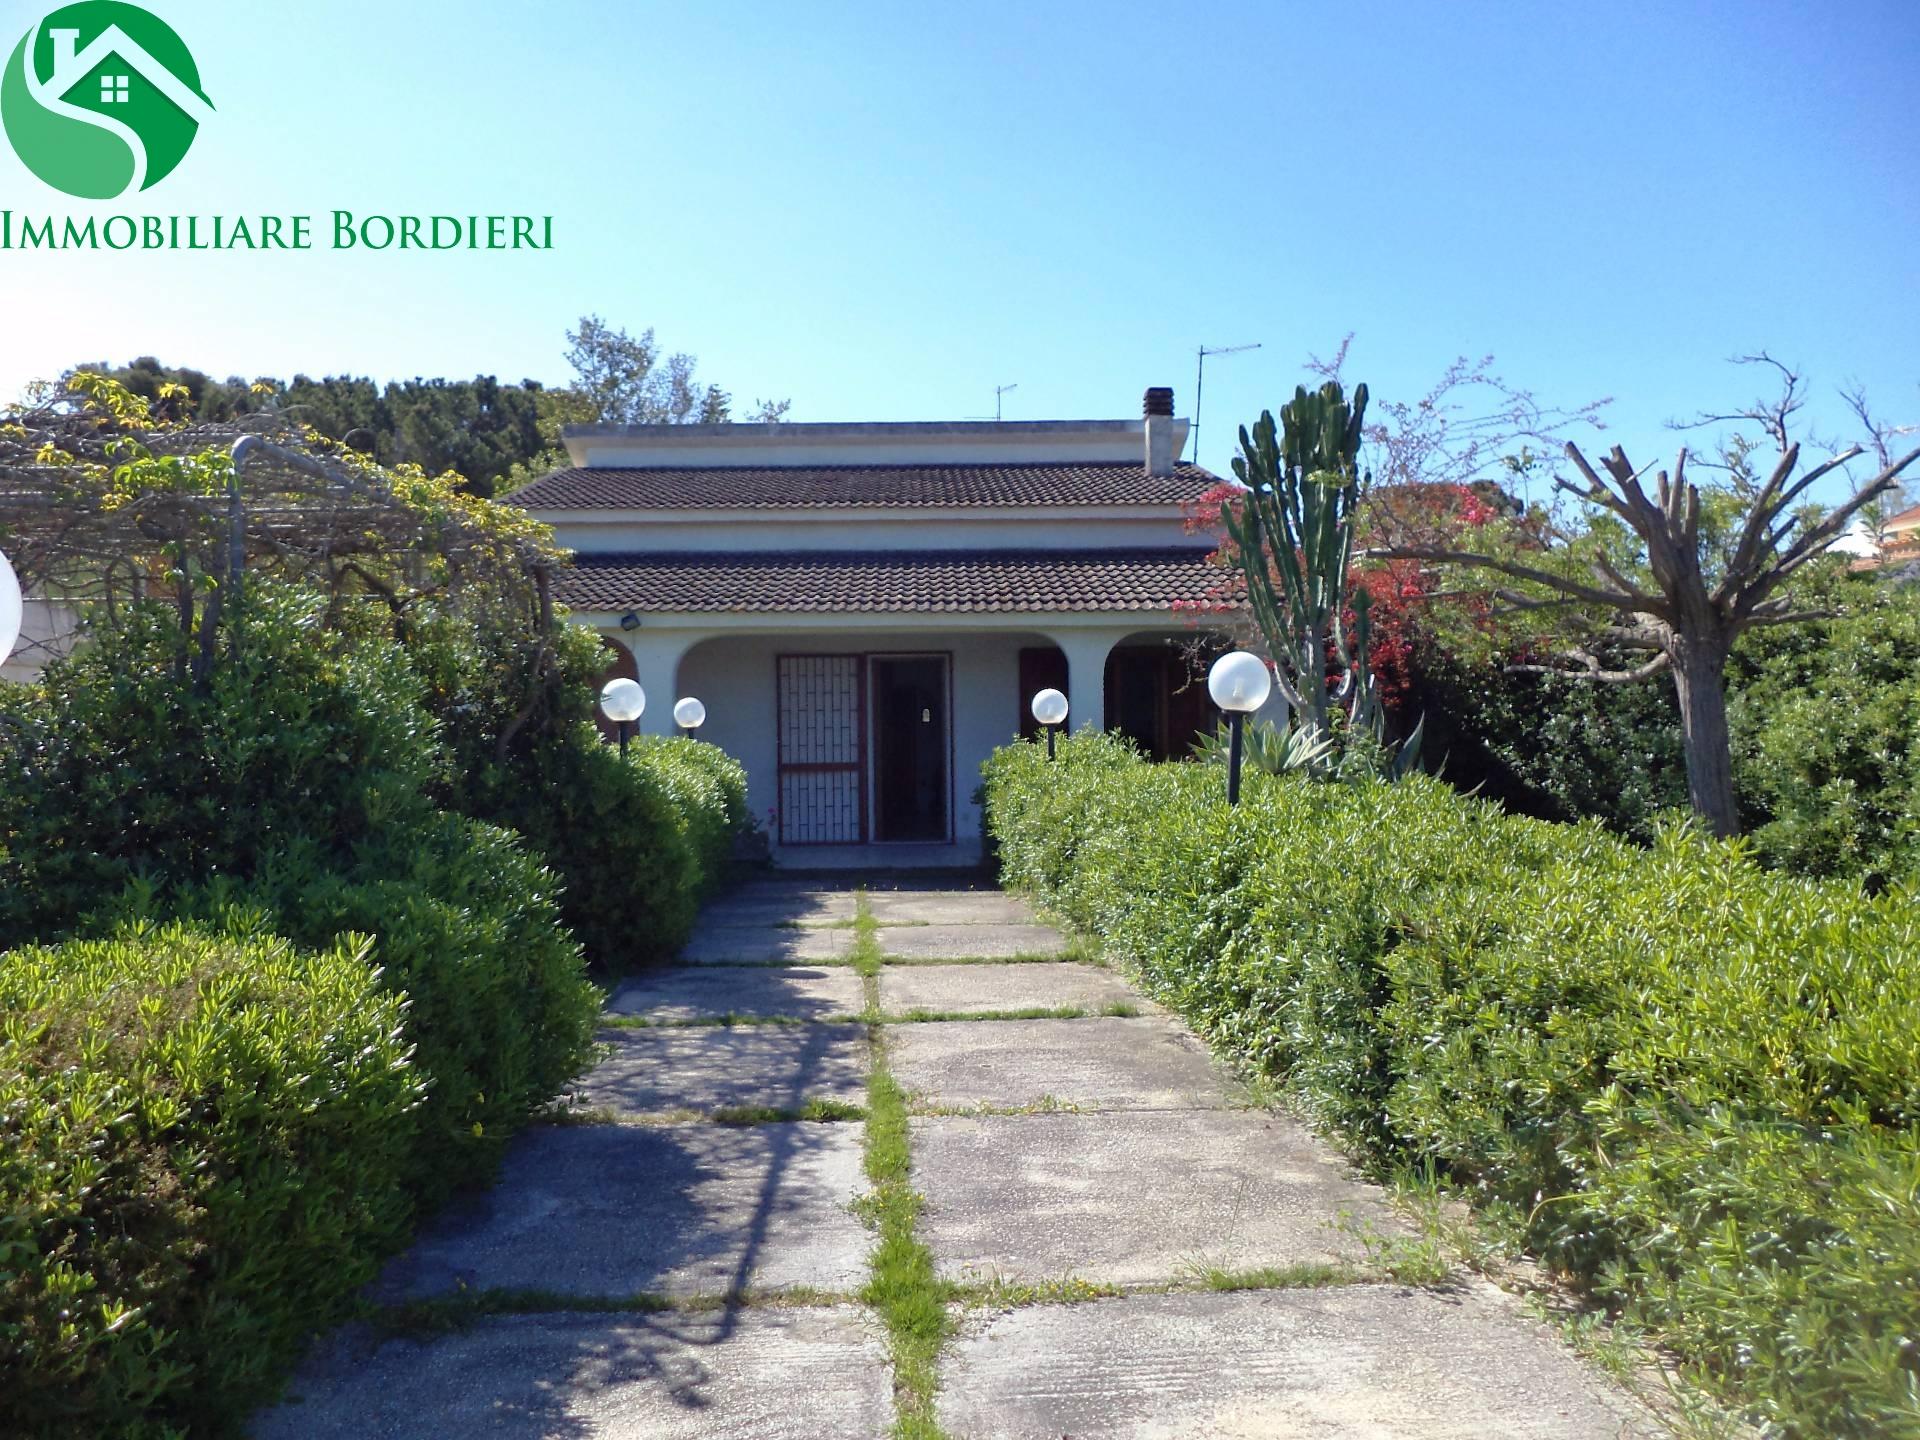 villa casa vendita siracusa di metri quadrati 140